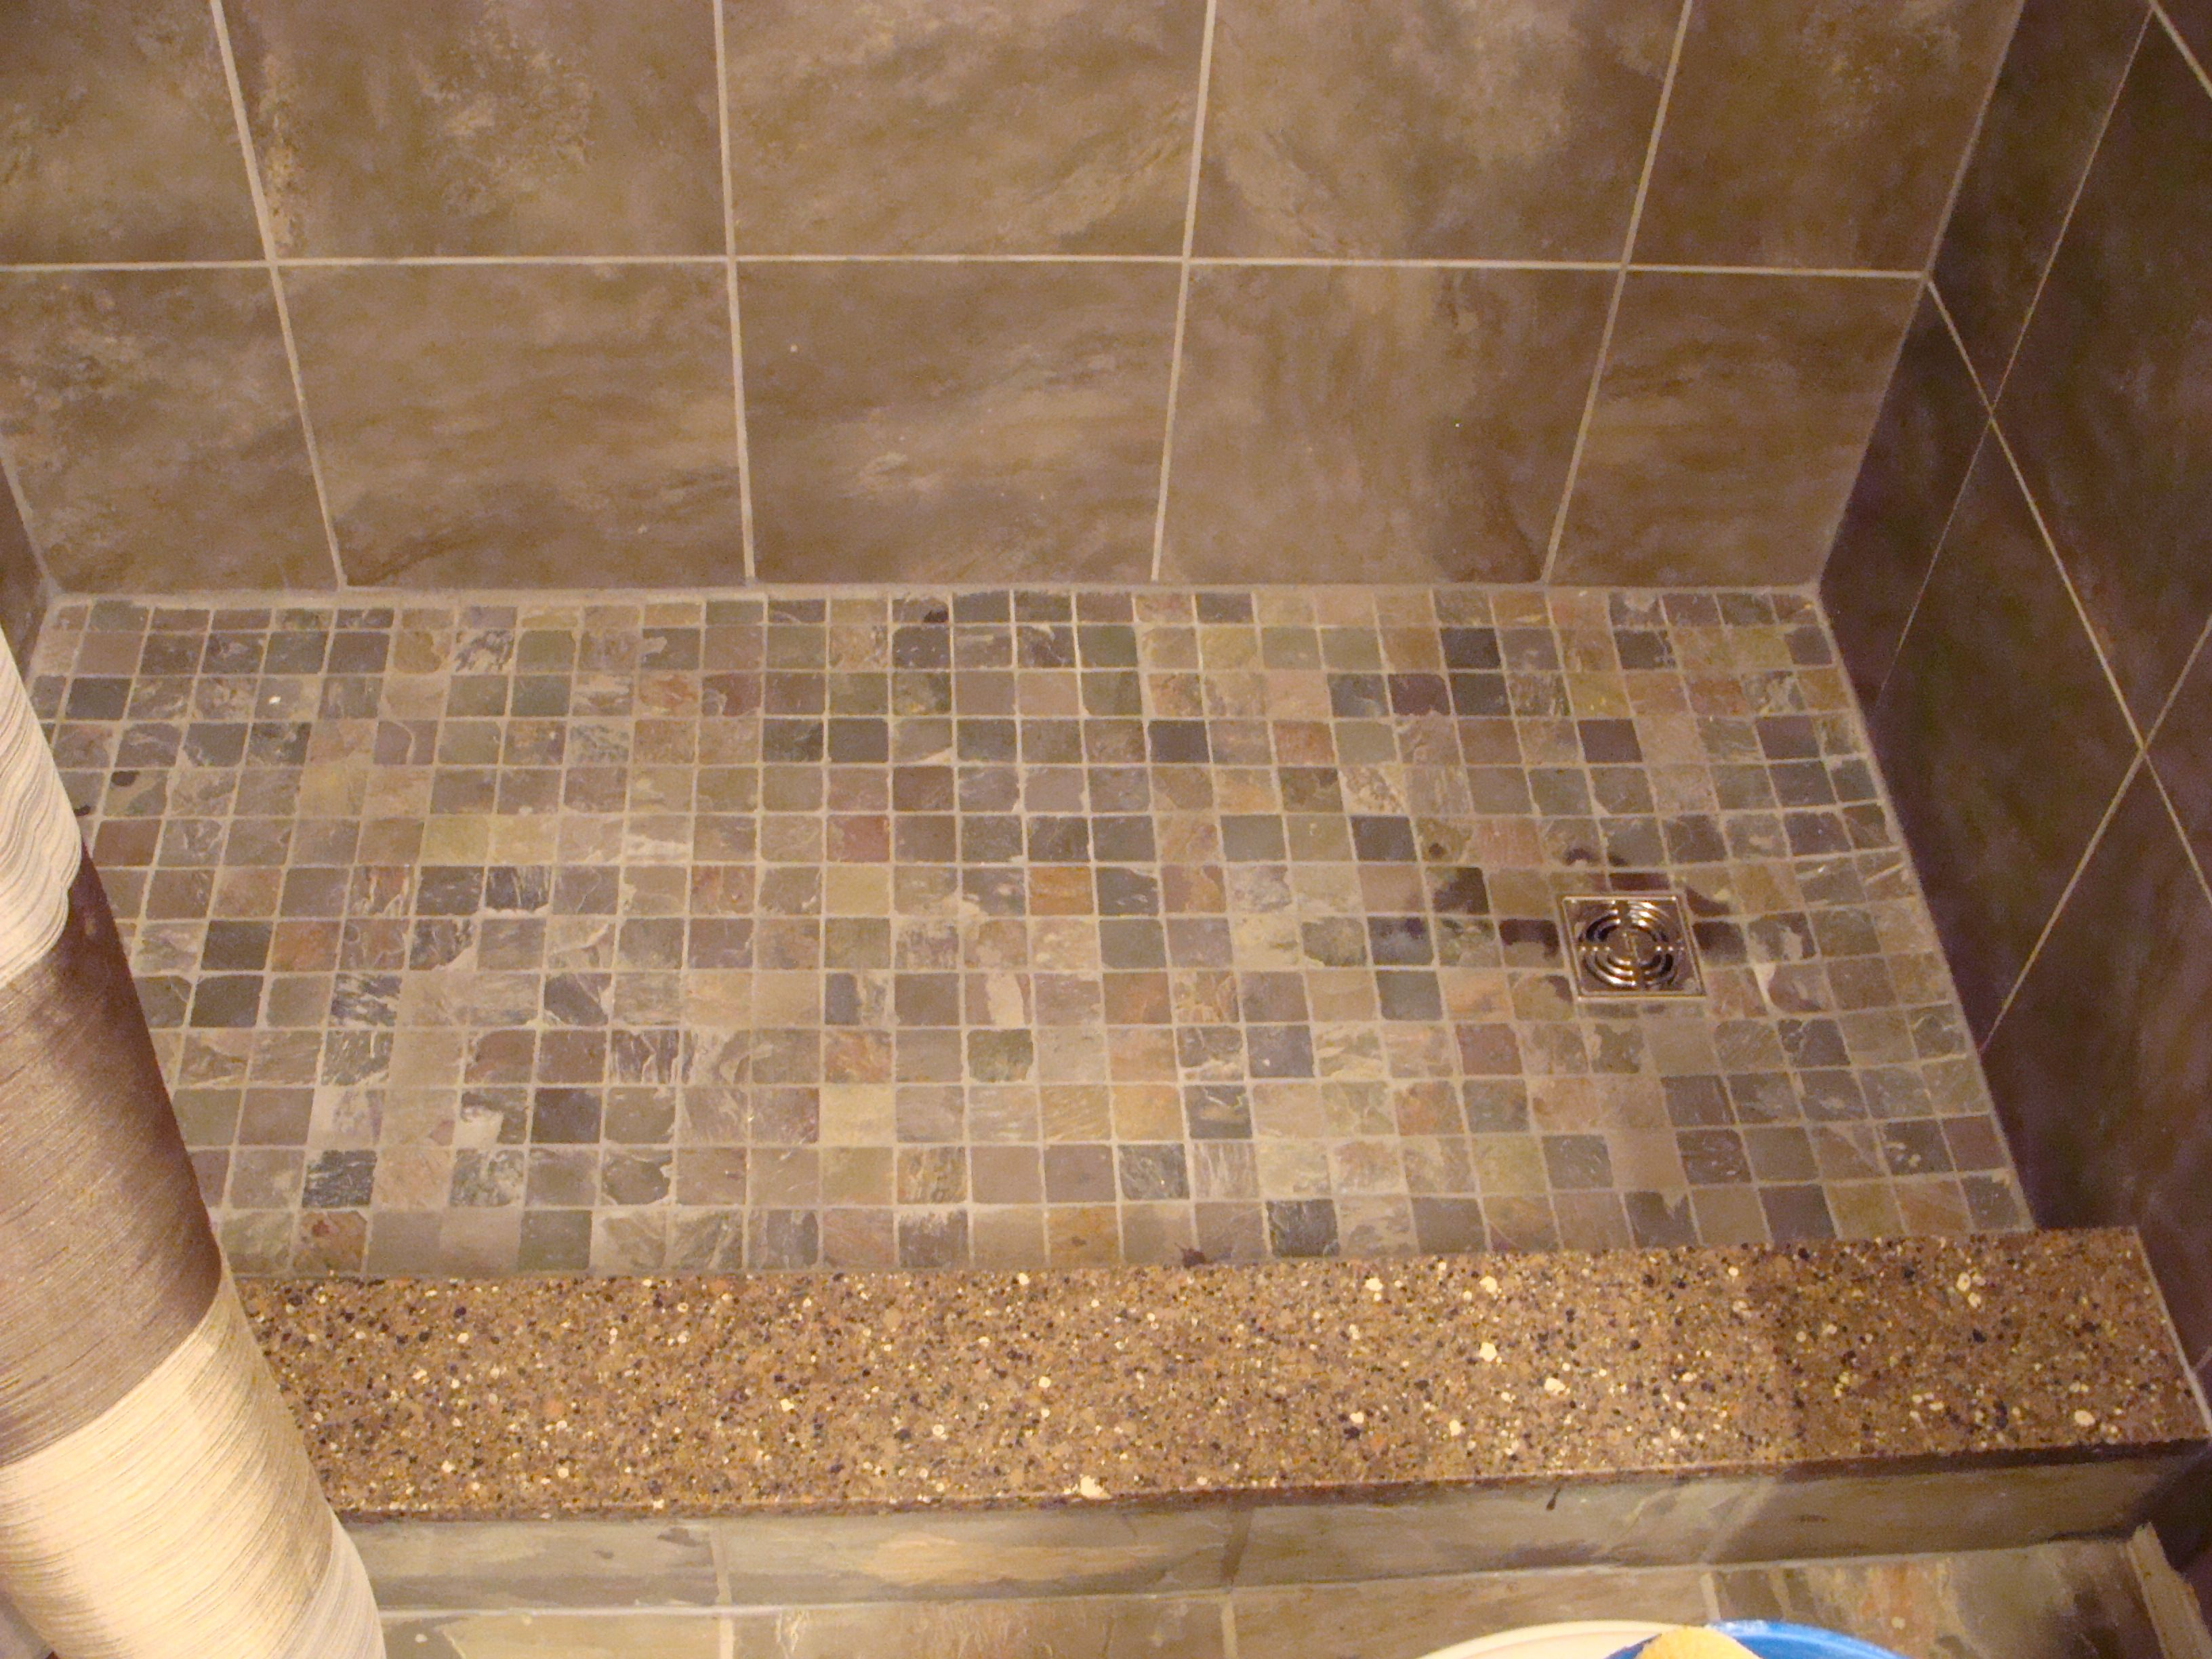 Slate Mosaic Tiles On Shower Floor Quartz Shower Curb